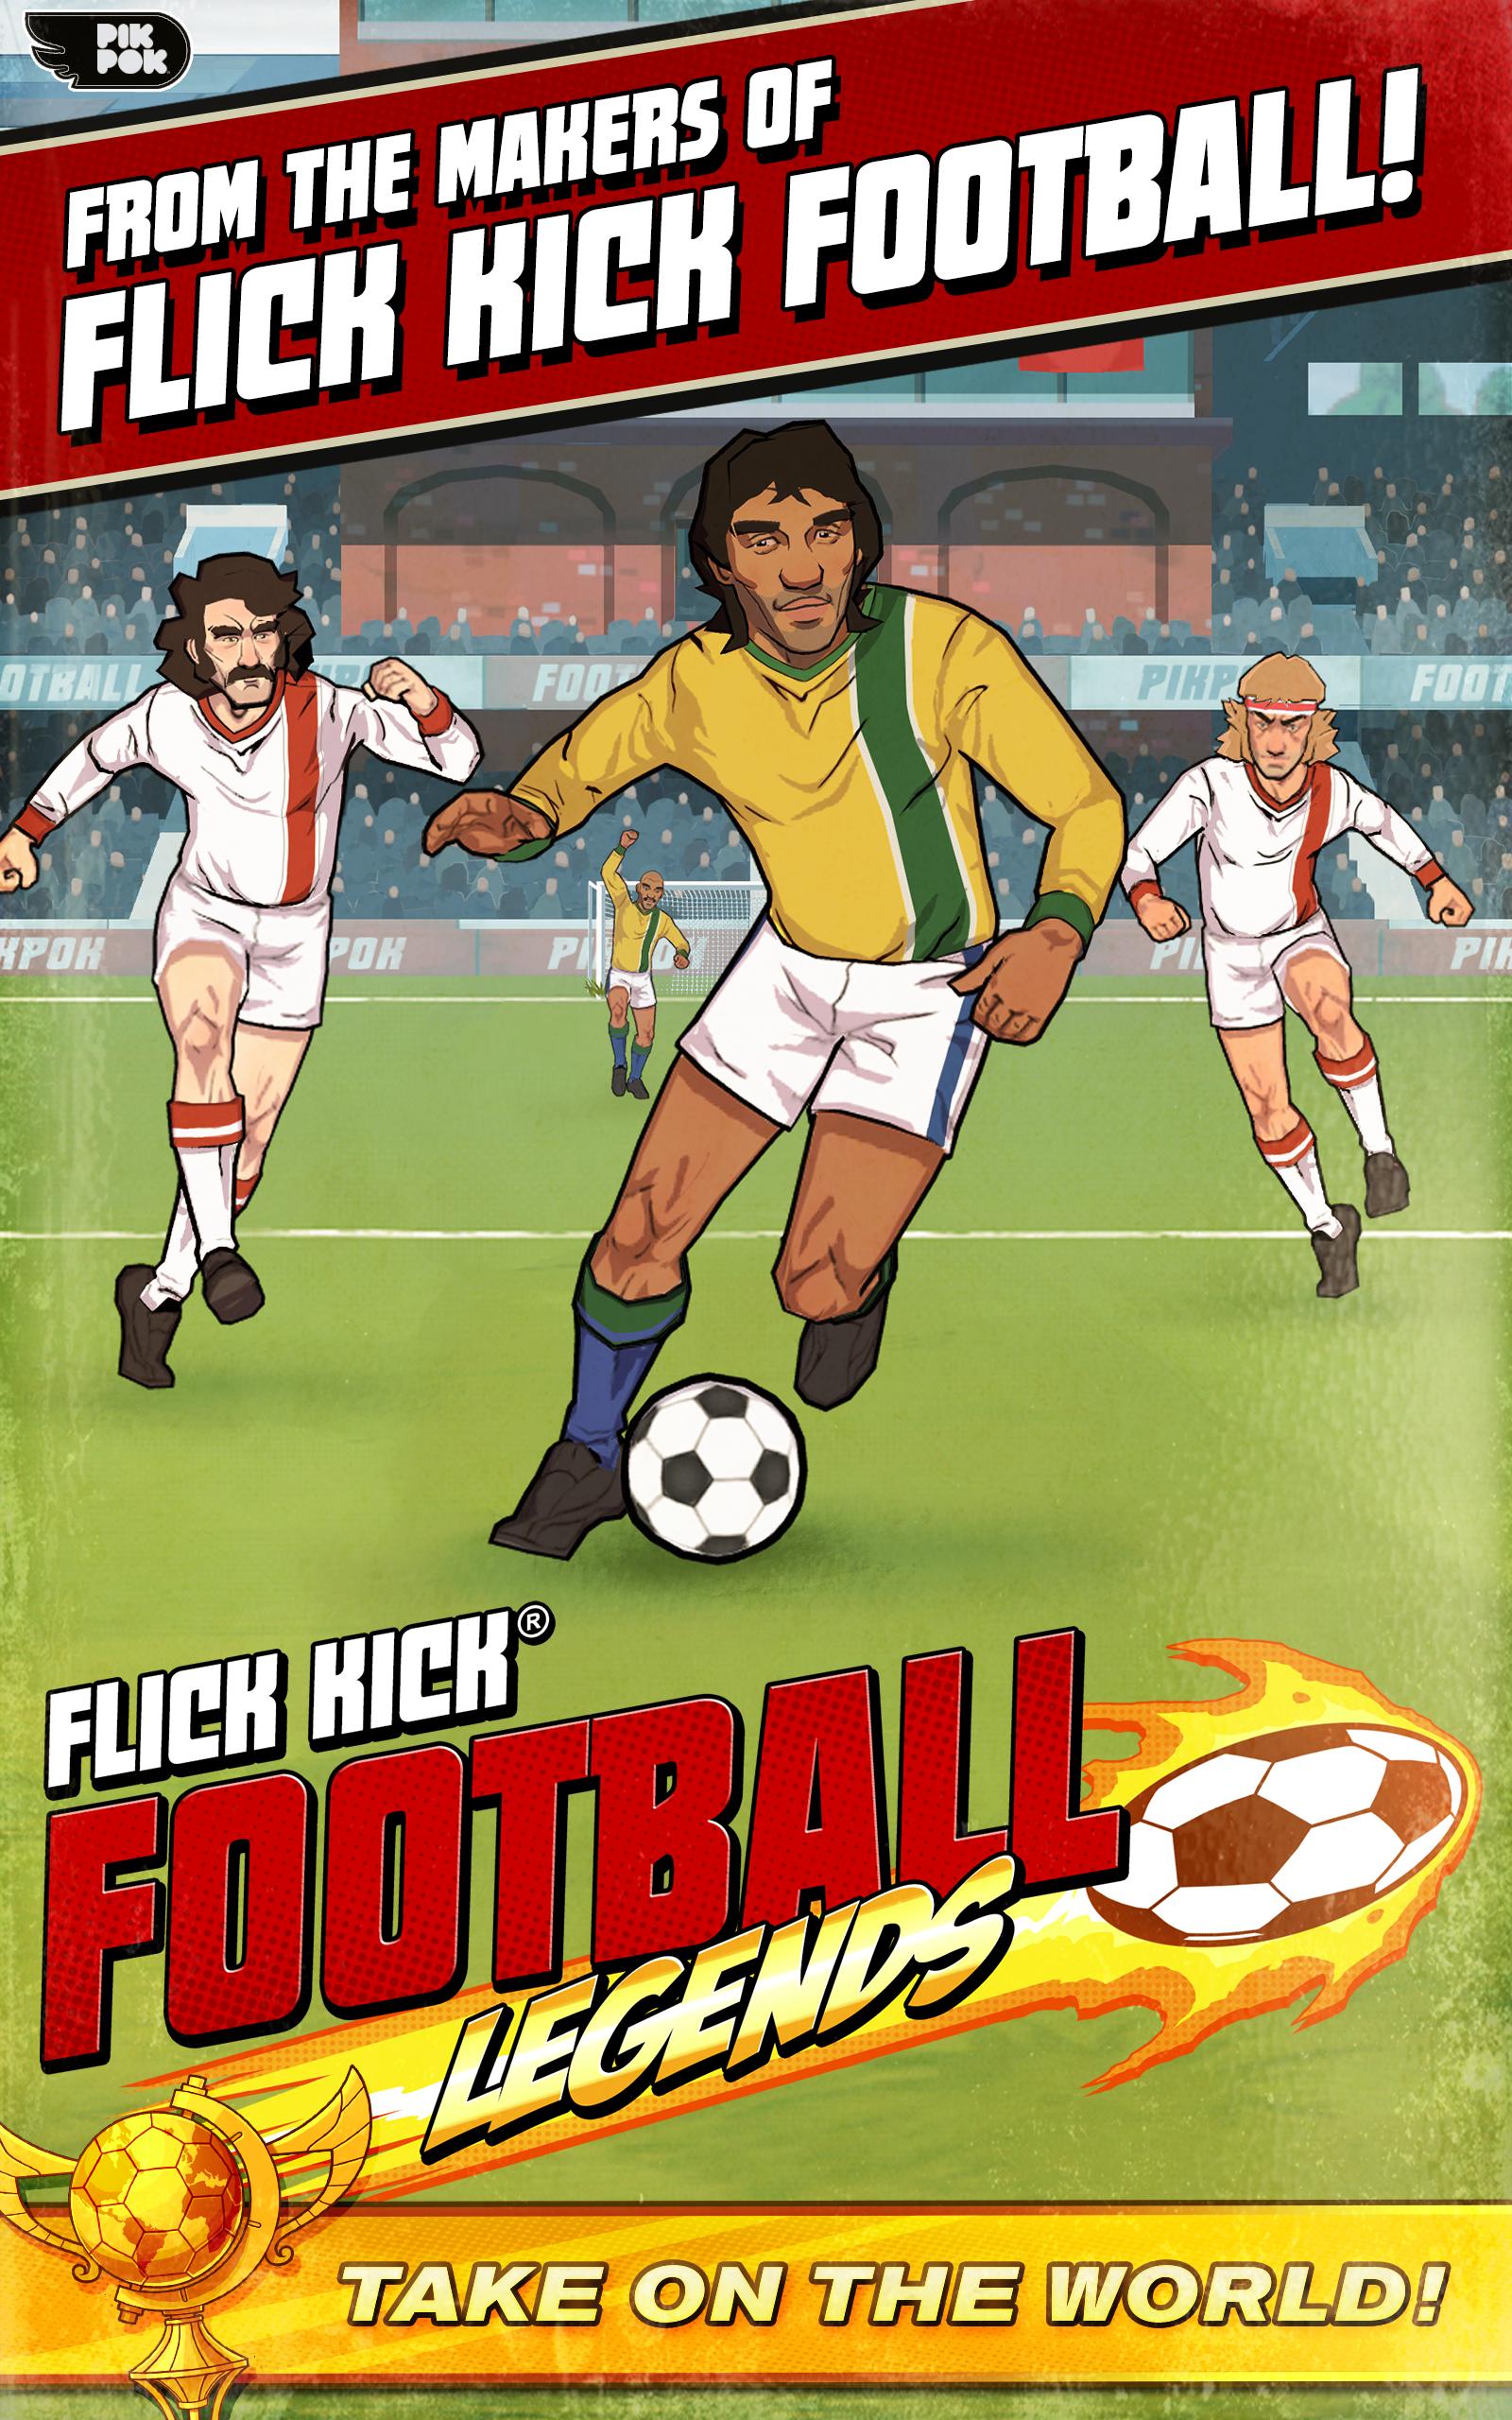 Flick Kick Football Legends screenshot #6